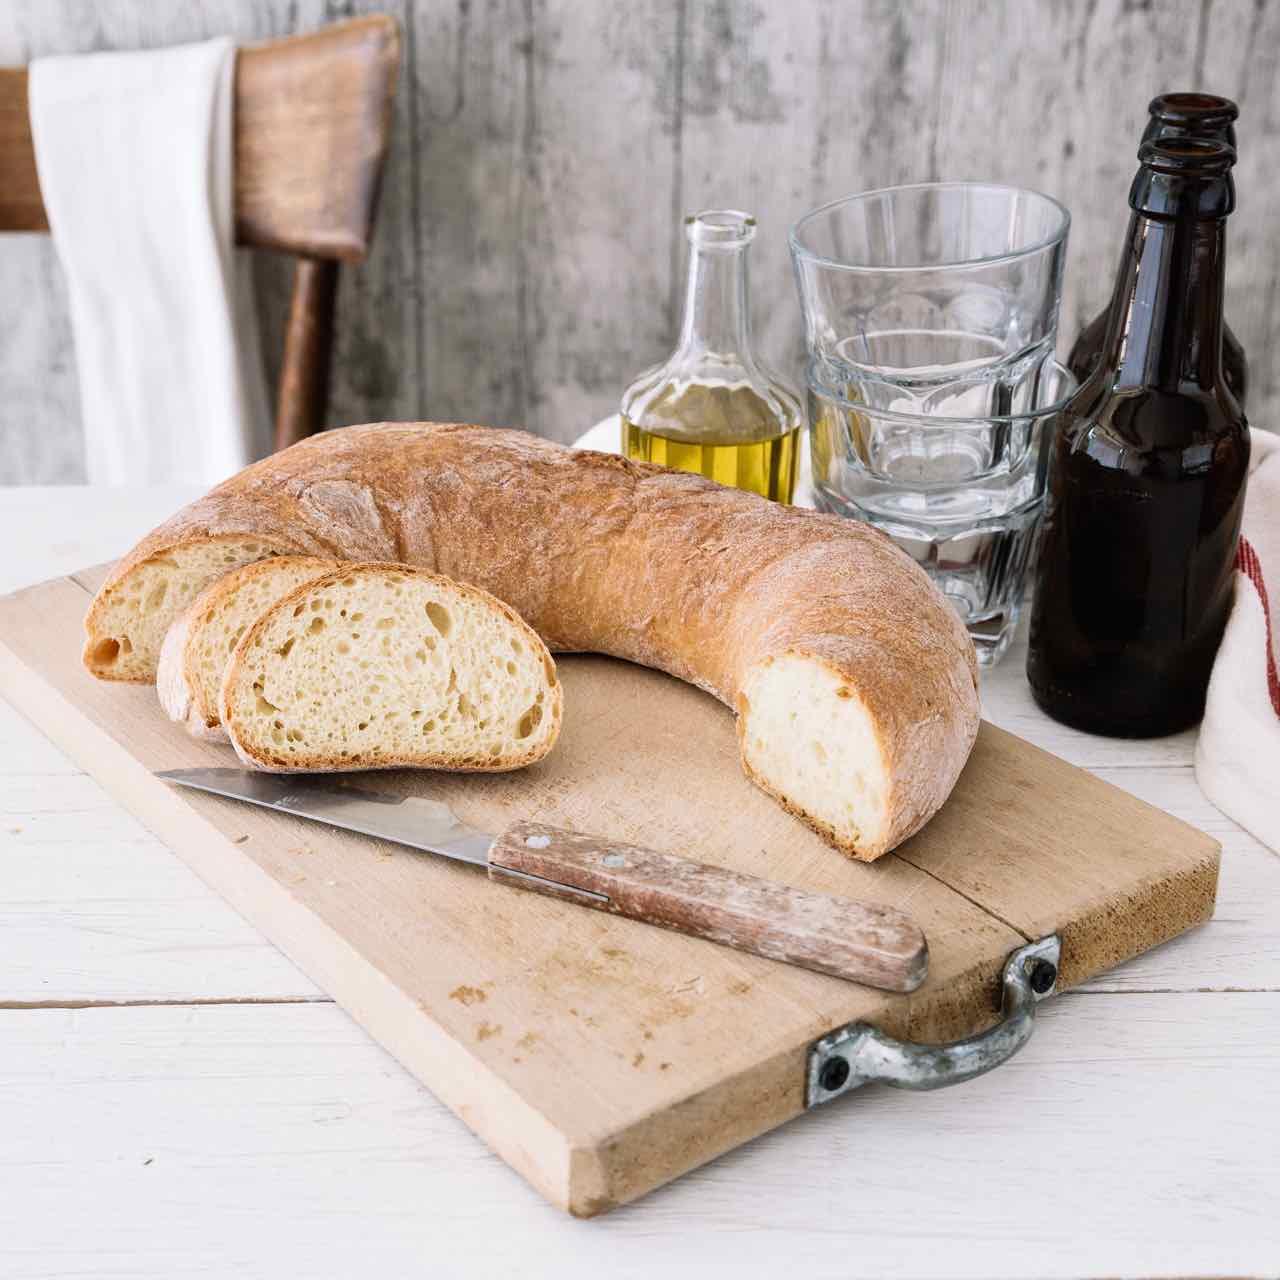 pane - bread - lievitati salati - savory recipes - opsd blog - sonia monagheddu - food photography - food styling